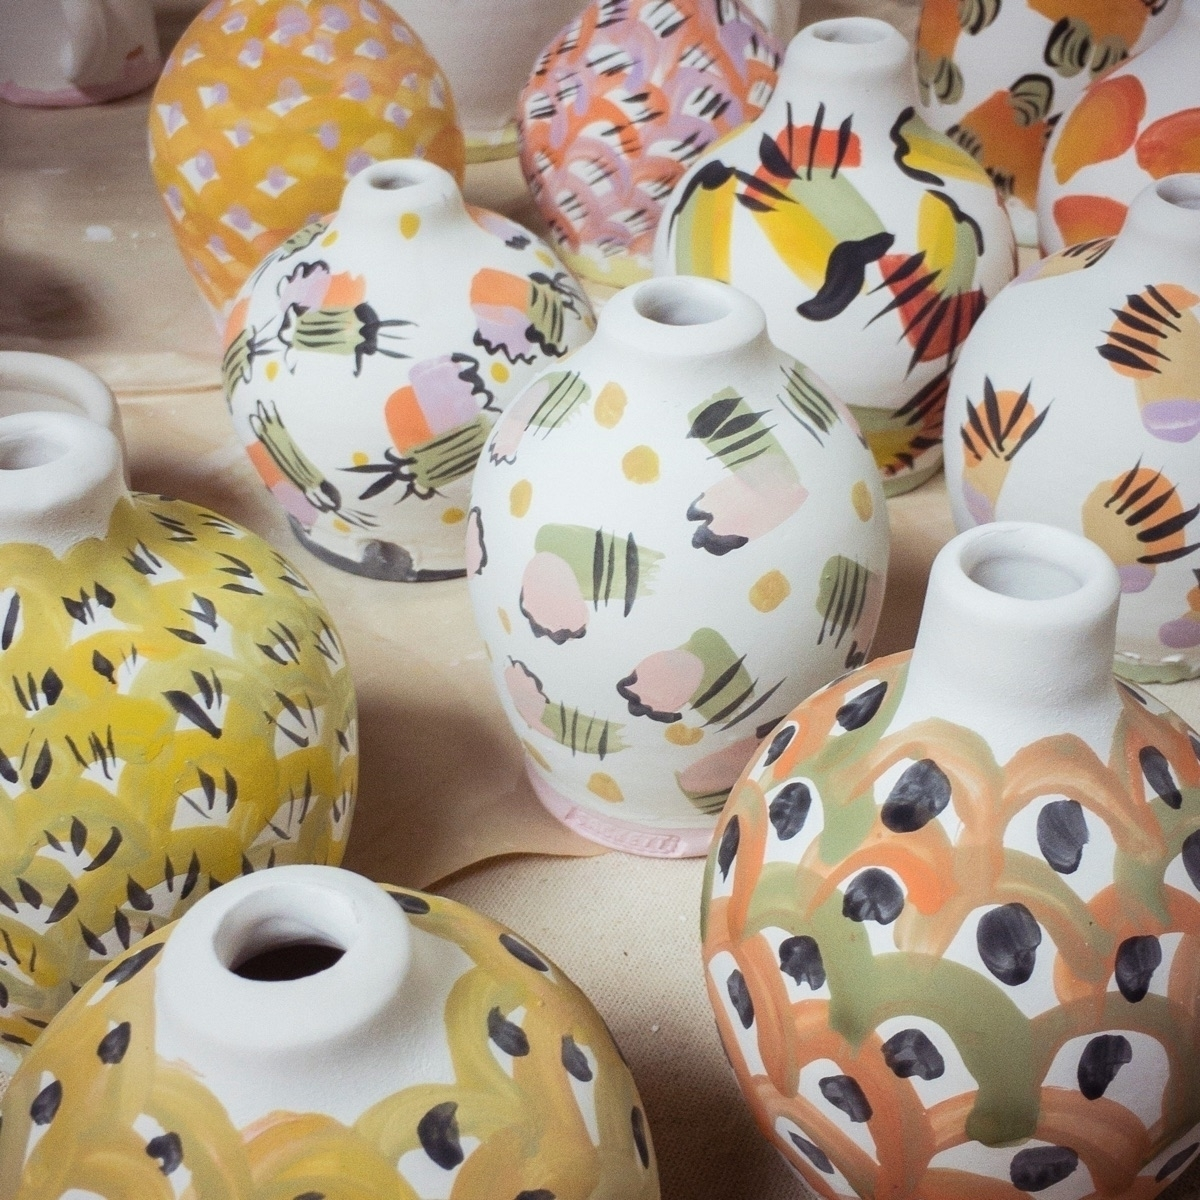 Glazing small vases - ceramic, ceramics - davidsackett | ello